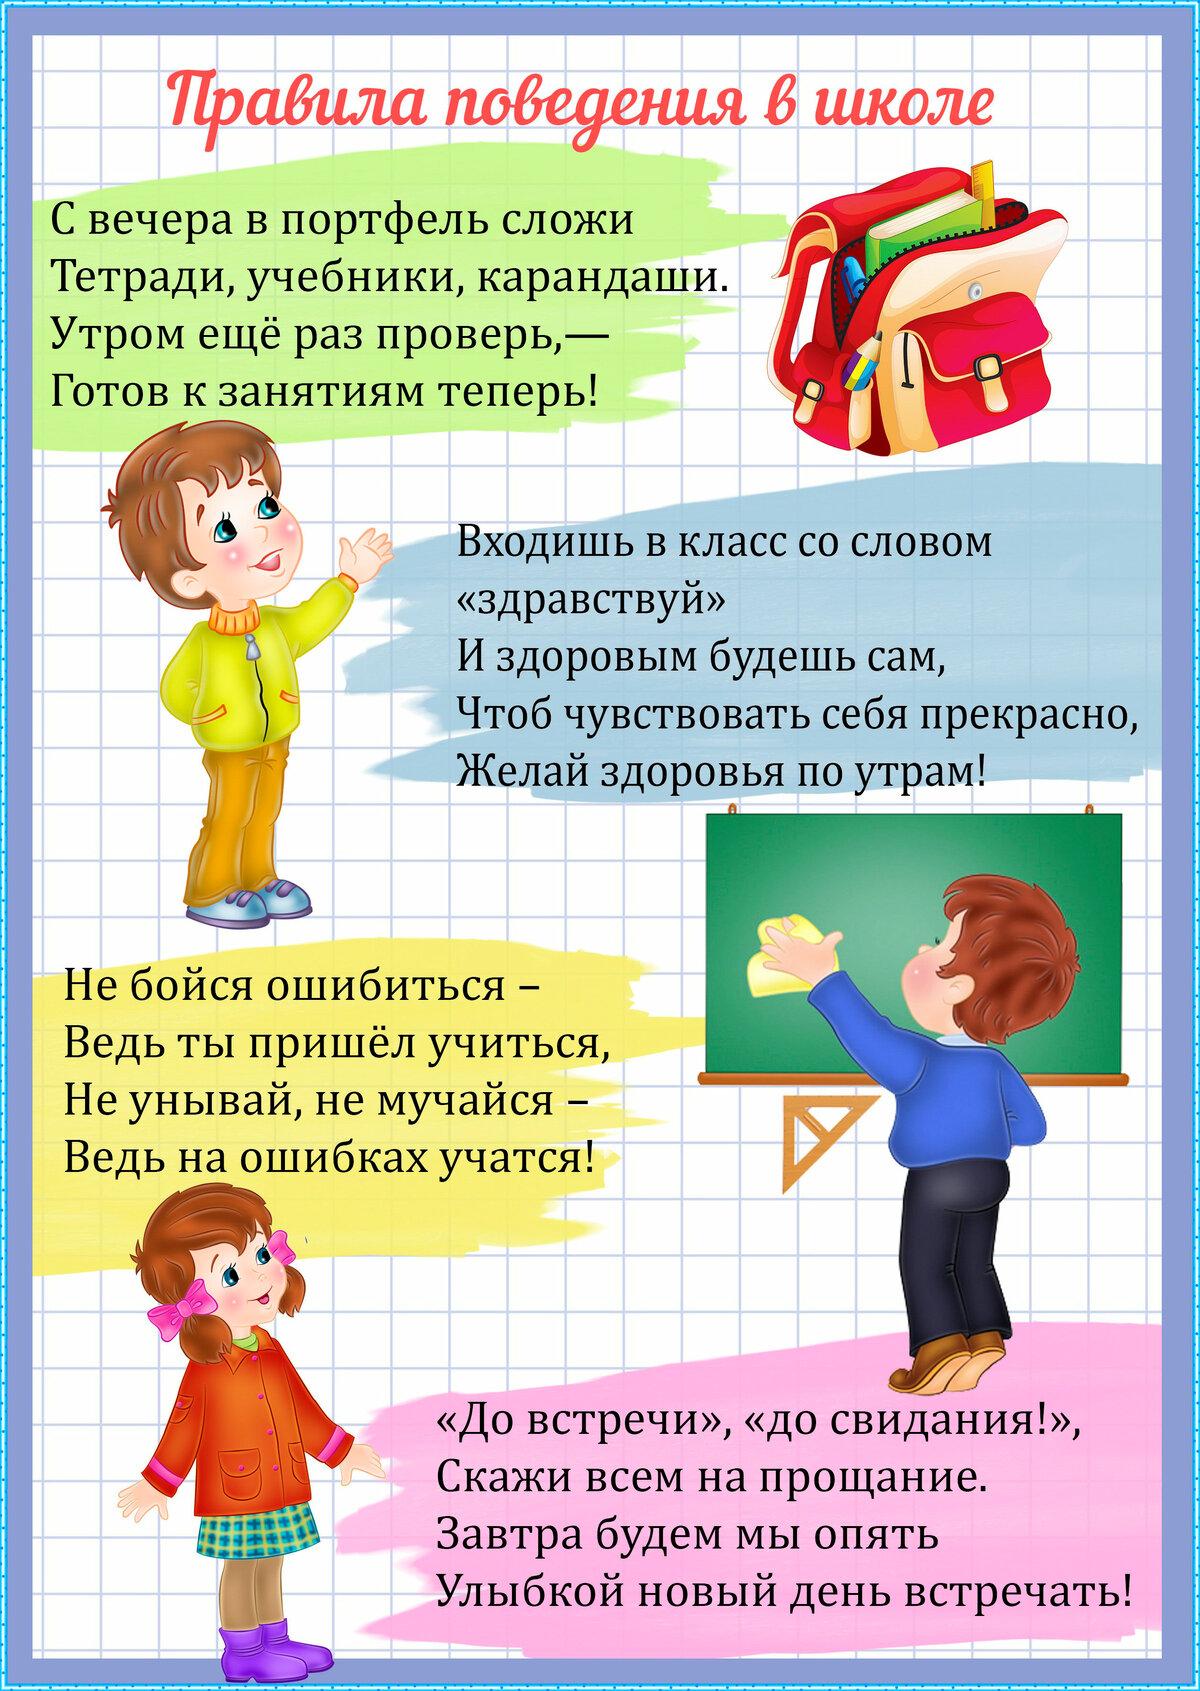 Картинки правила в классе